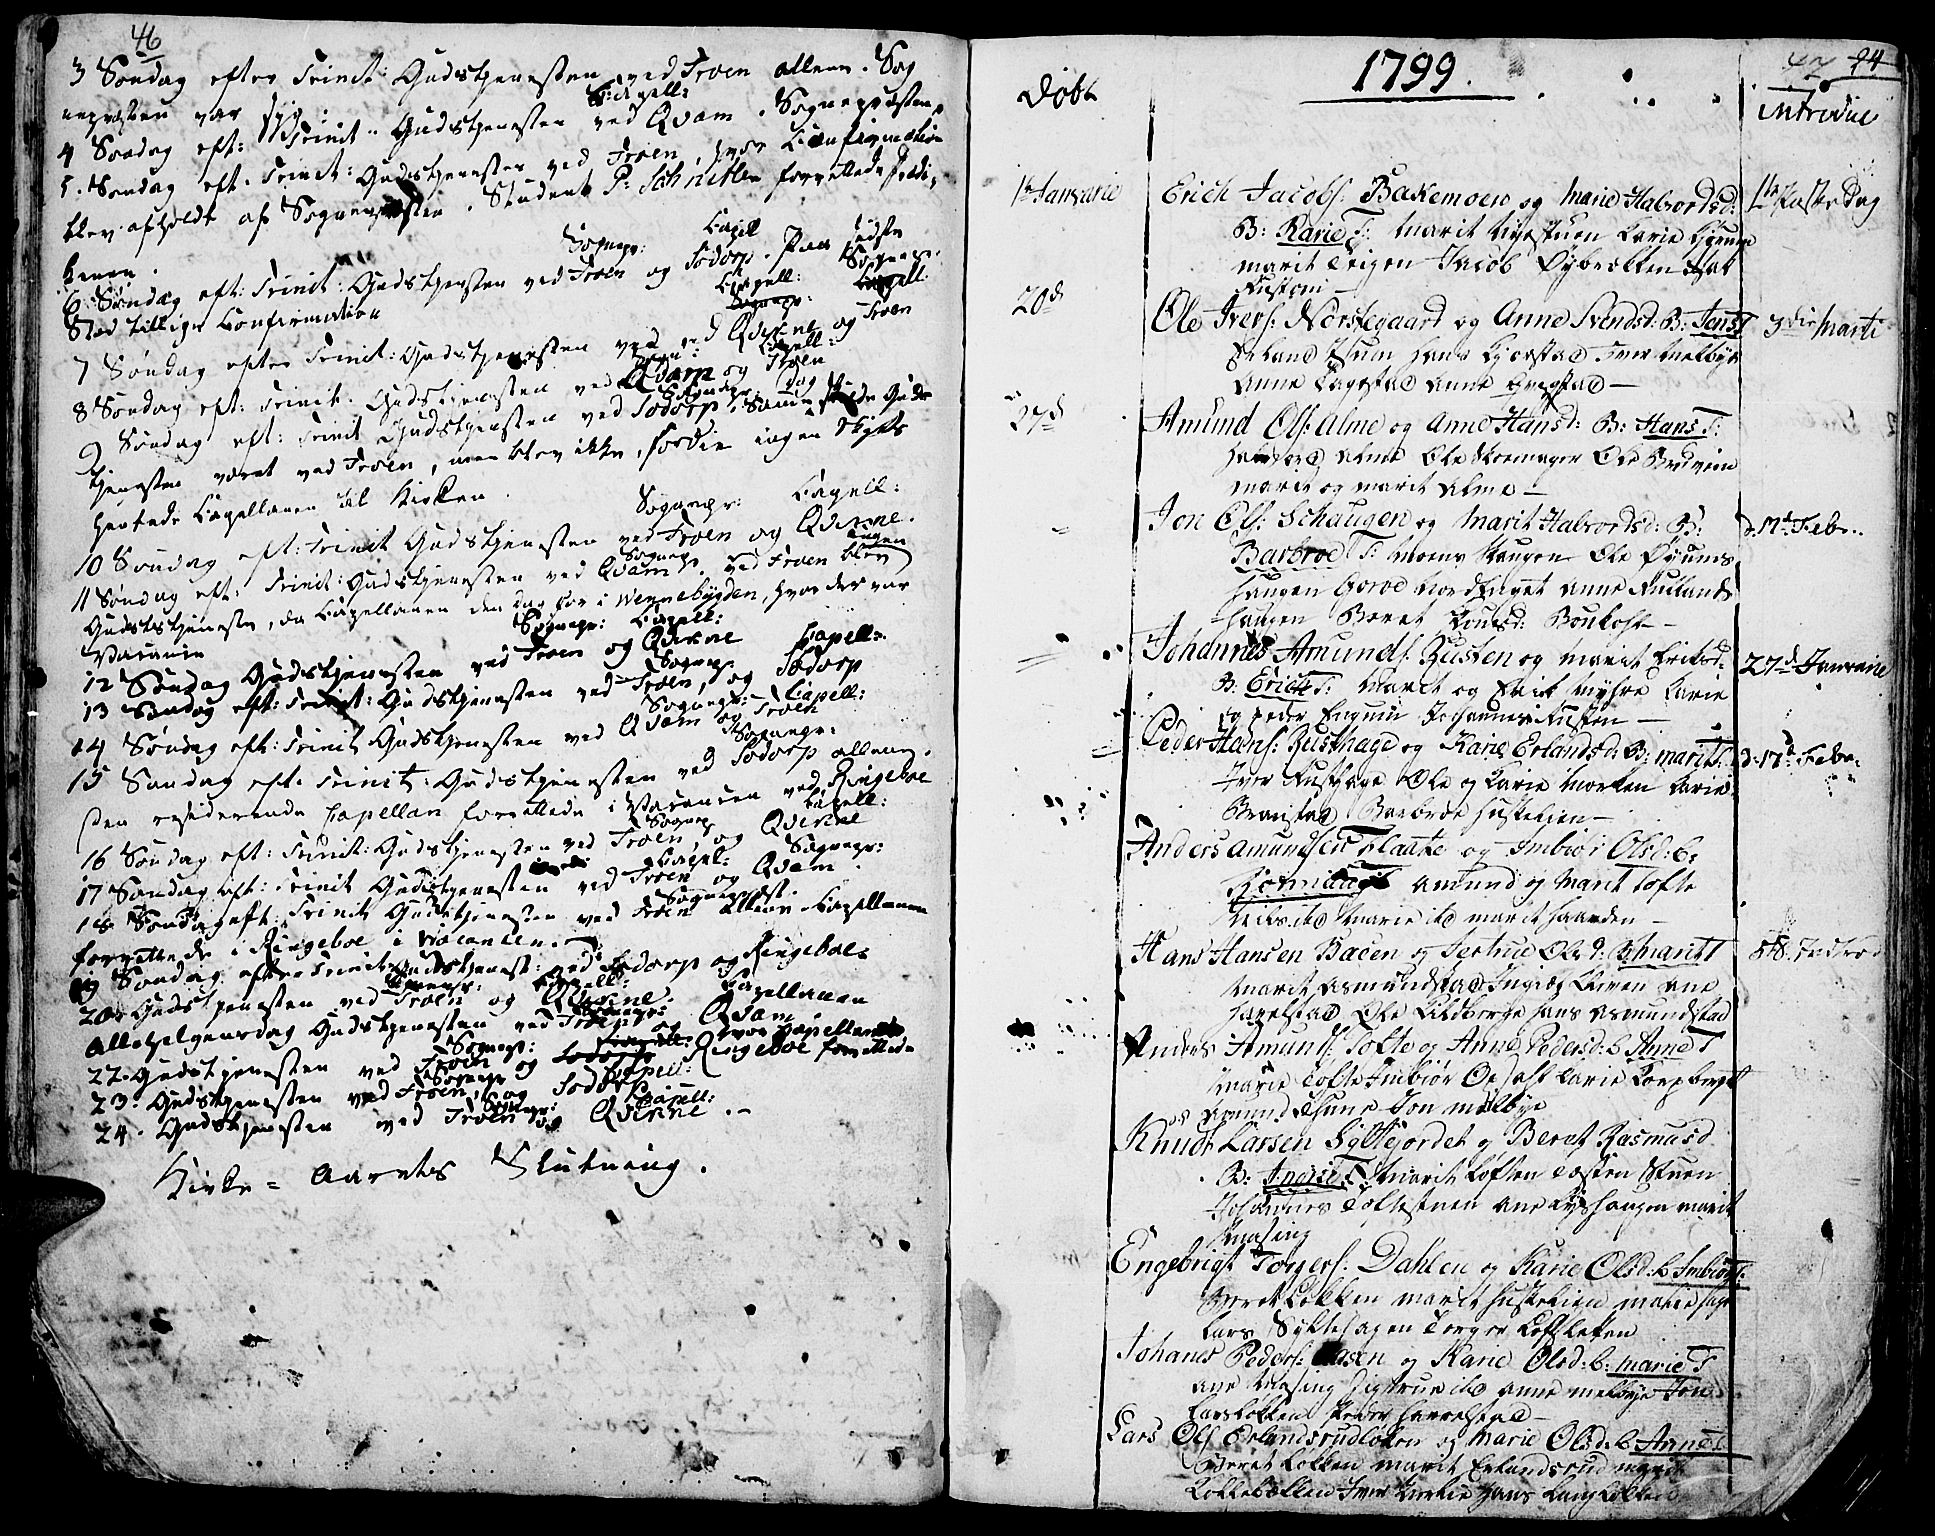 SAH, Fron prestekontor, H/Ha/Haa/L0001: Ministerialbok nr. 1, 1799-1816, s. 46-47